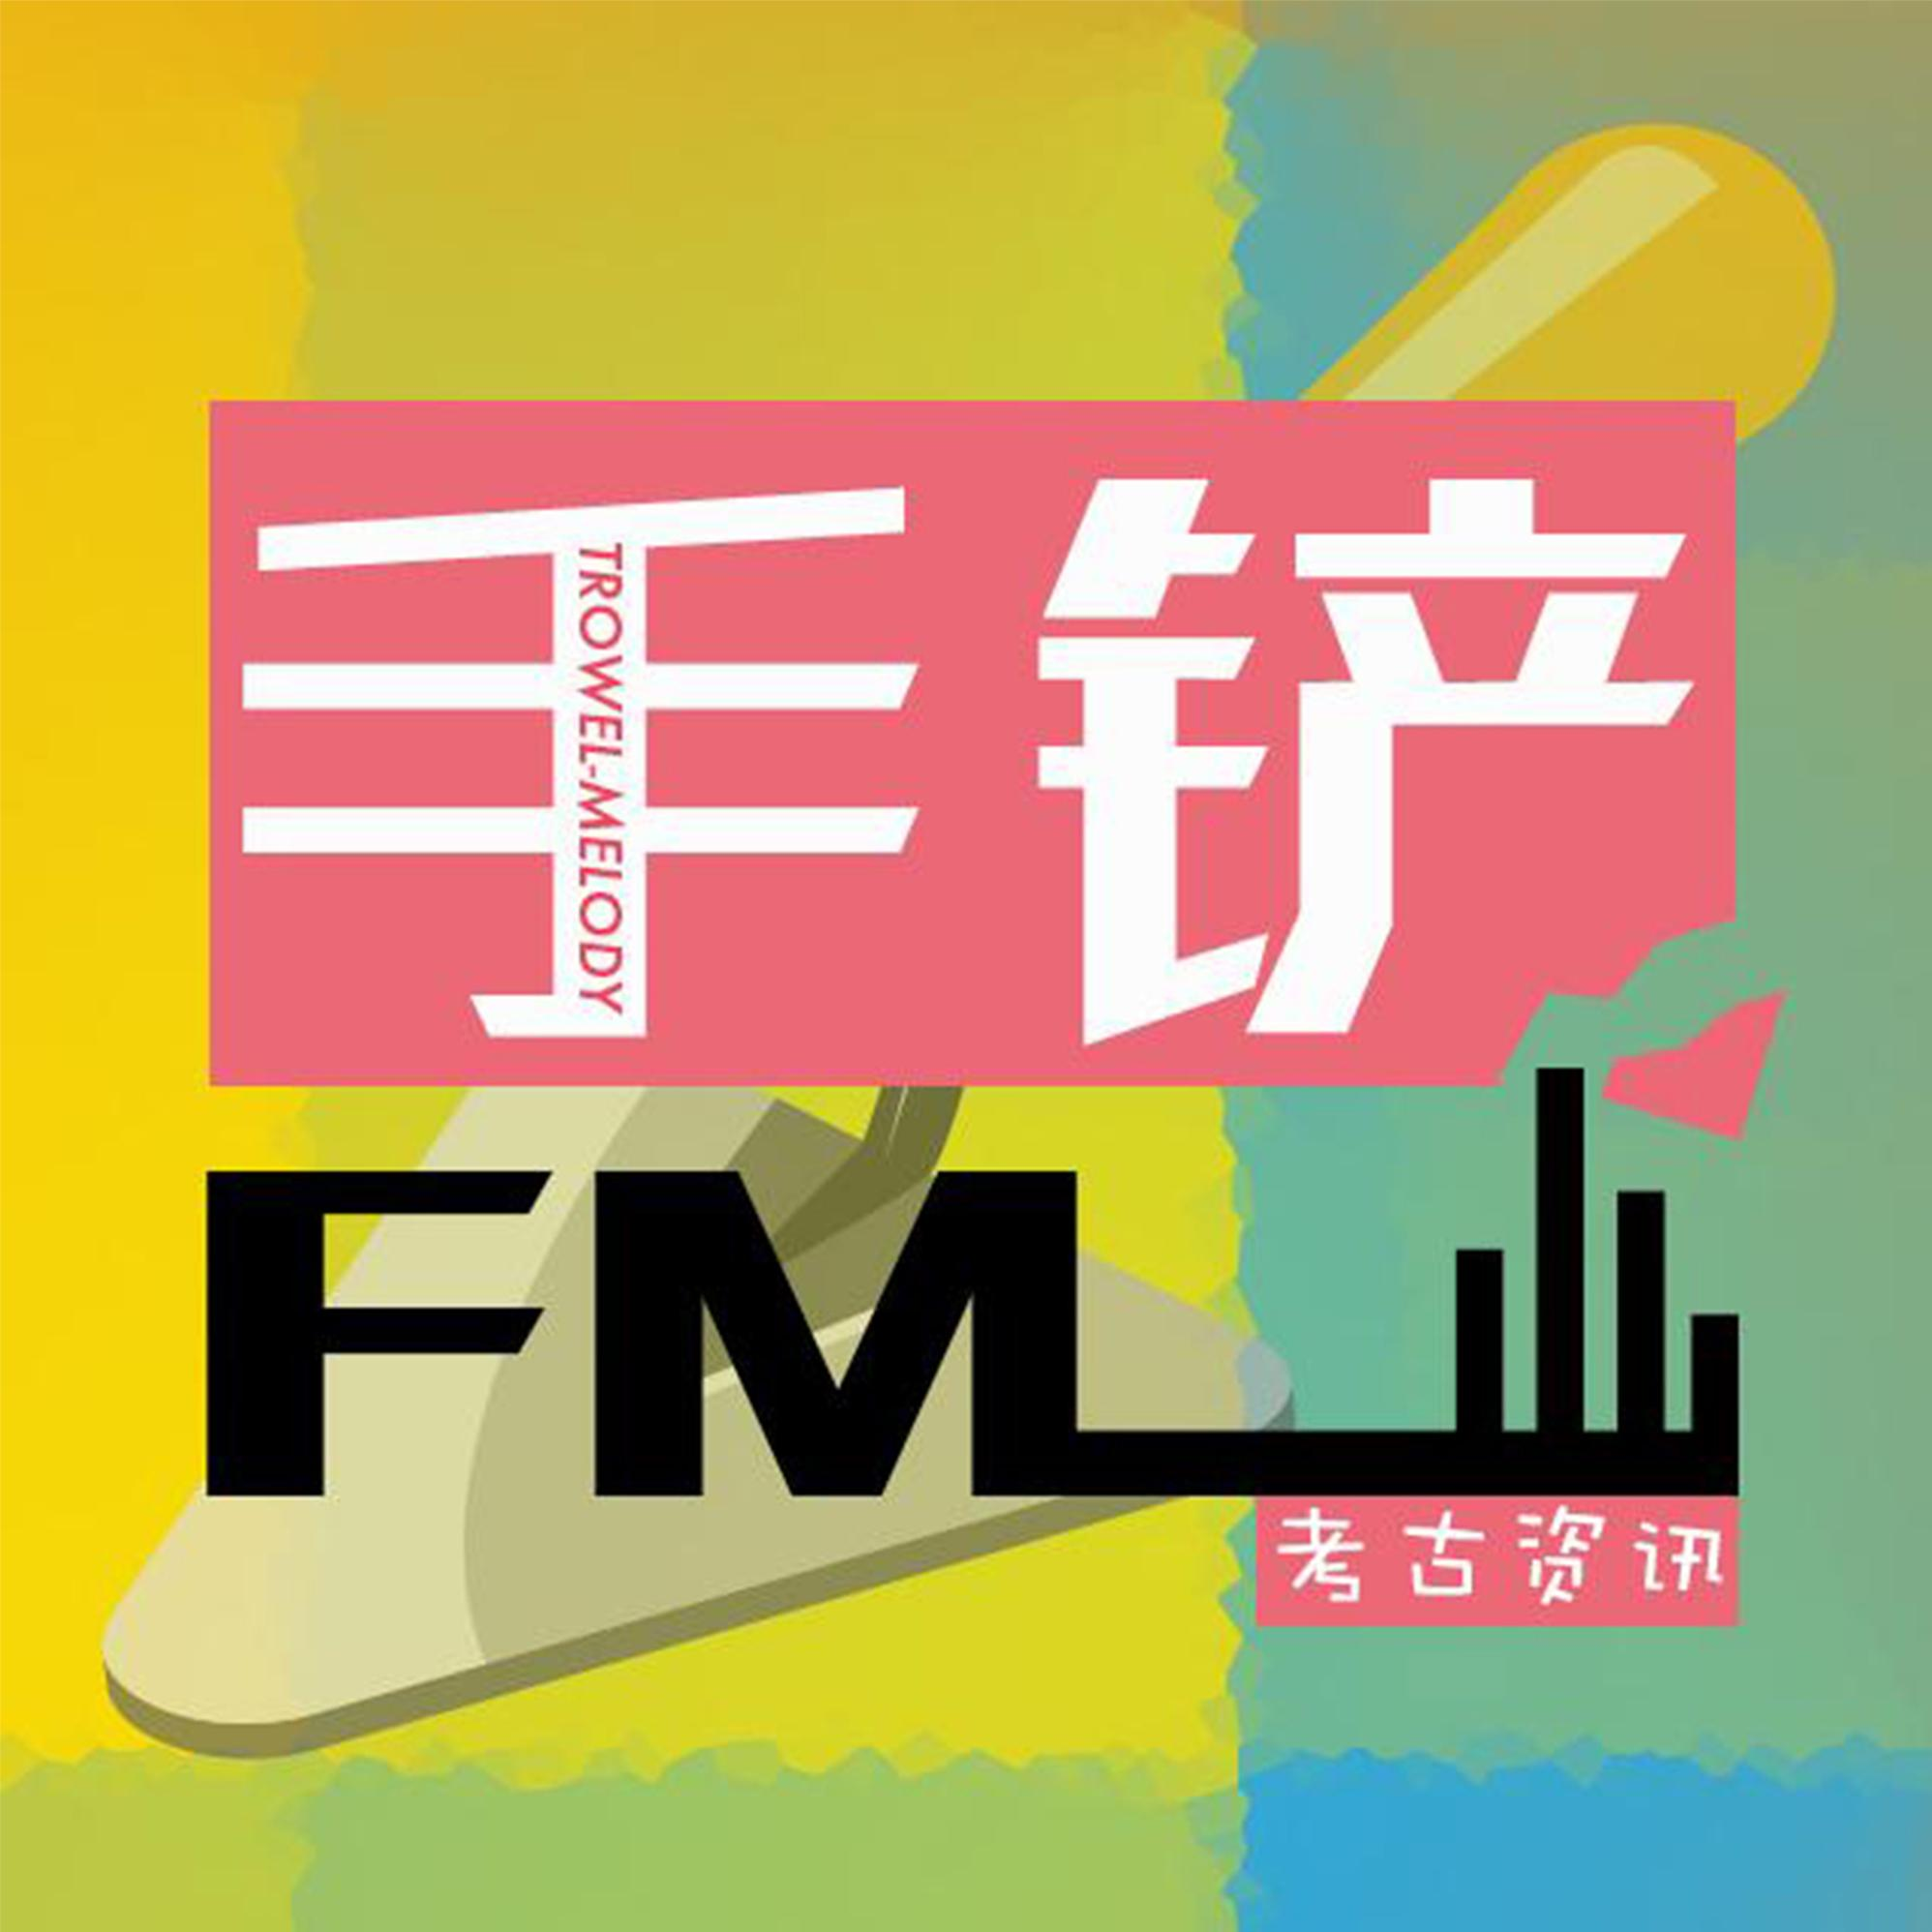 <![CDATA[手铲FM]]>